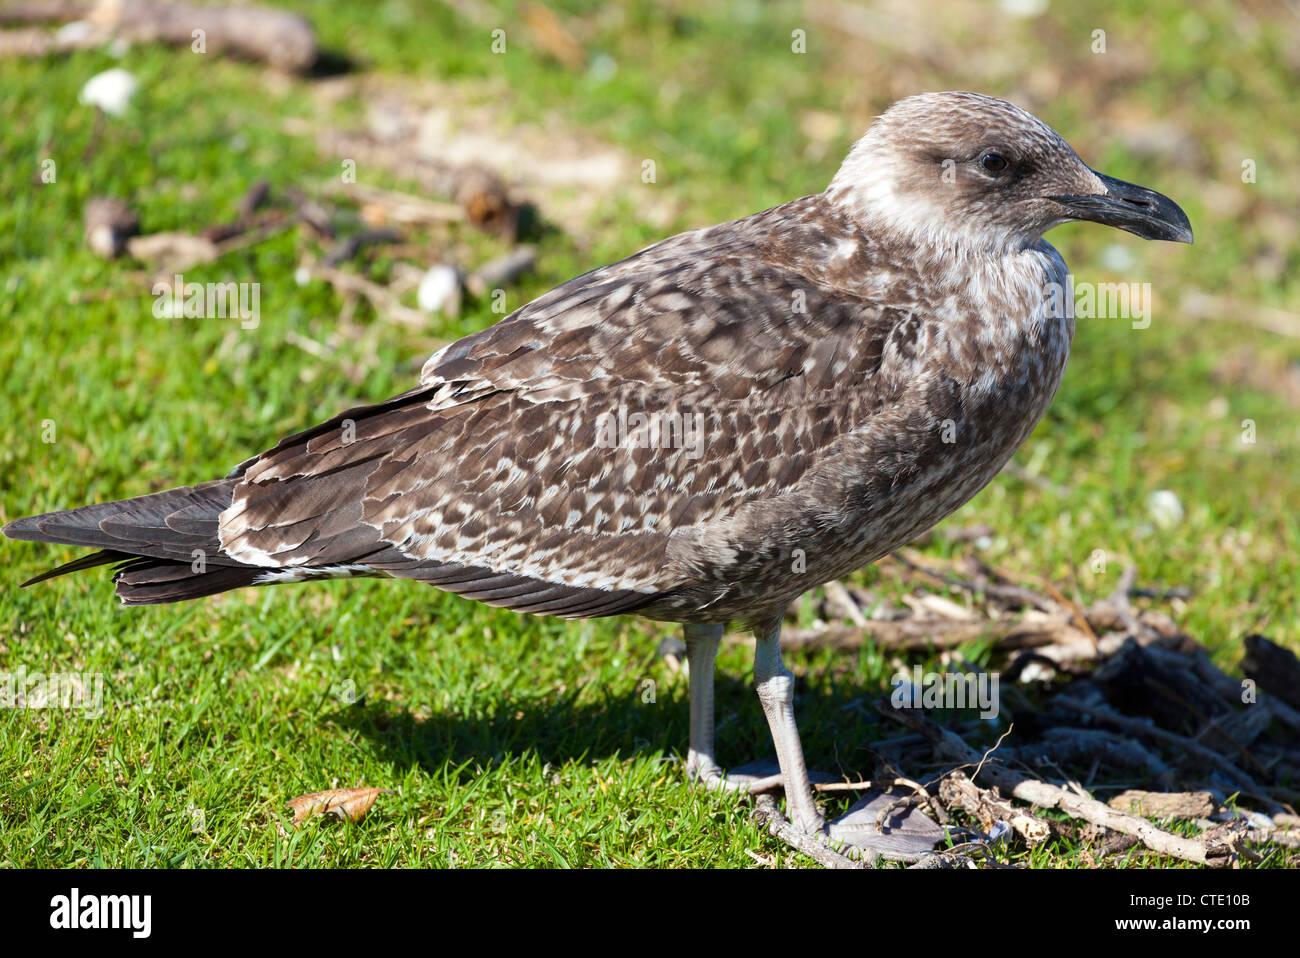 Juvenile seagull, Bay of Islands, New Zealand - Stock Image